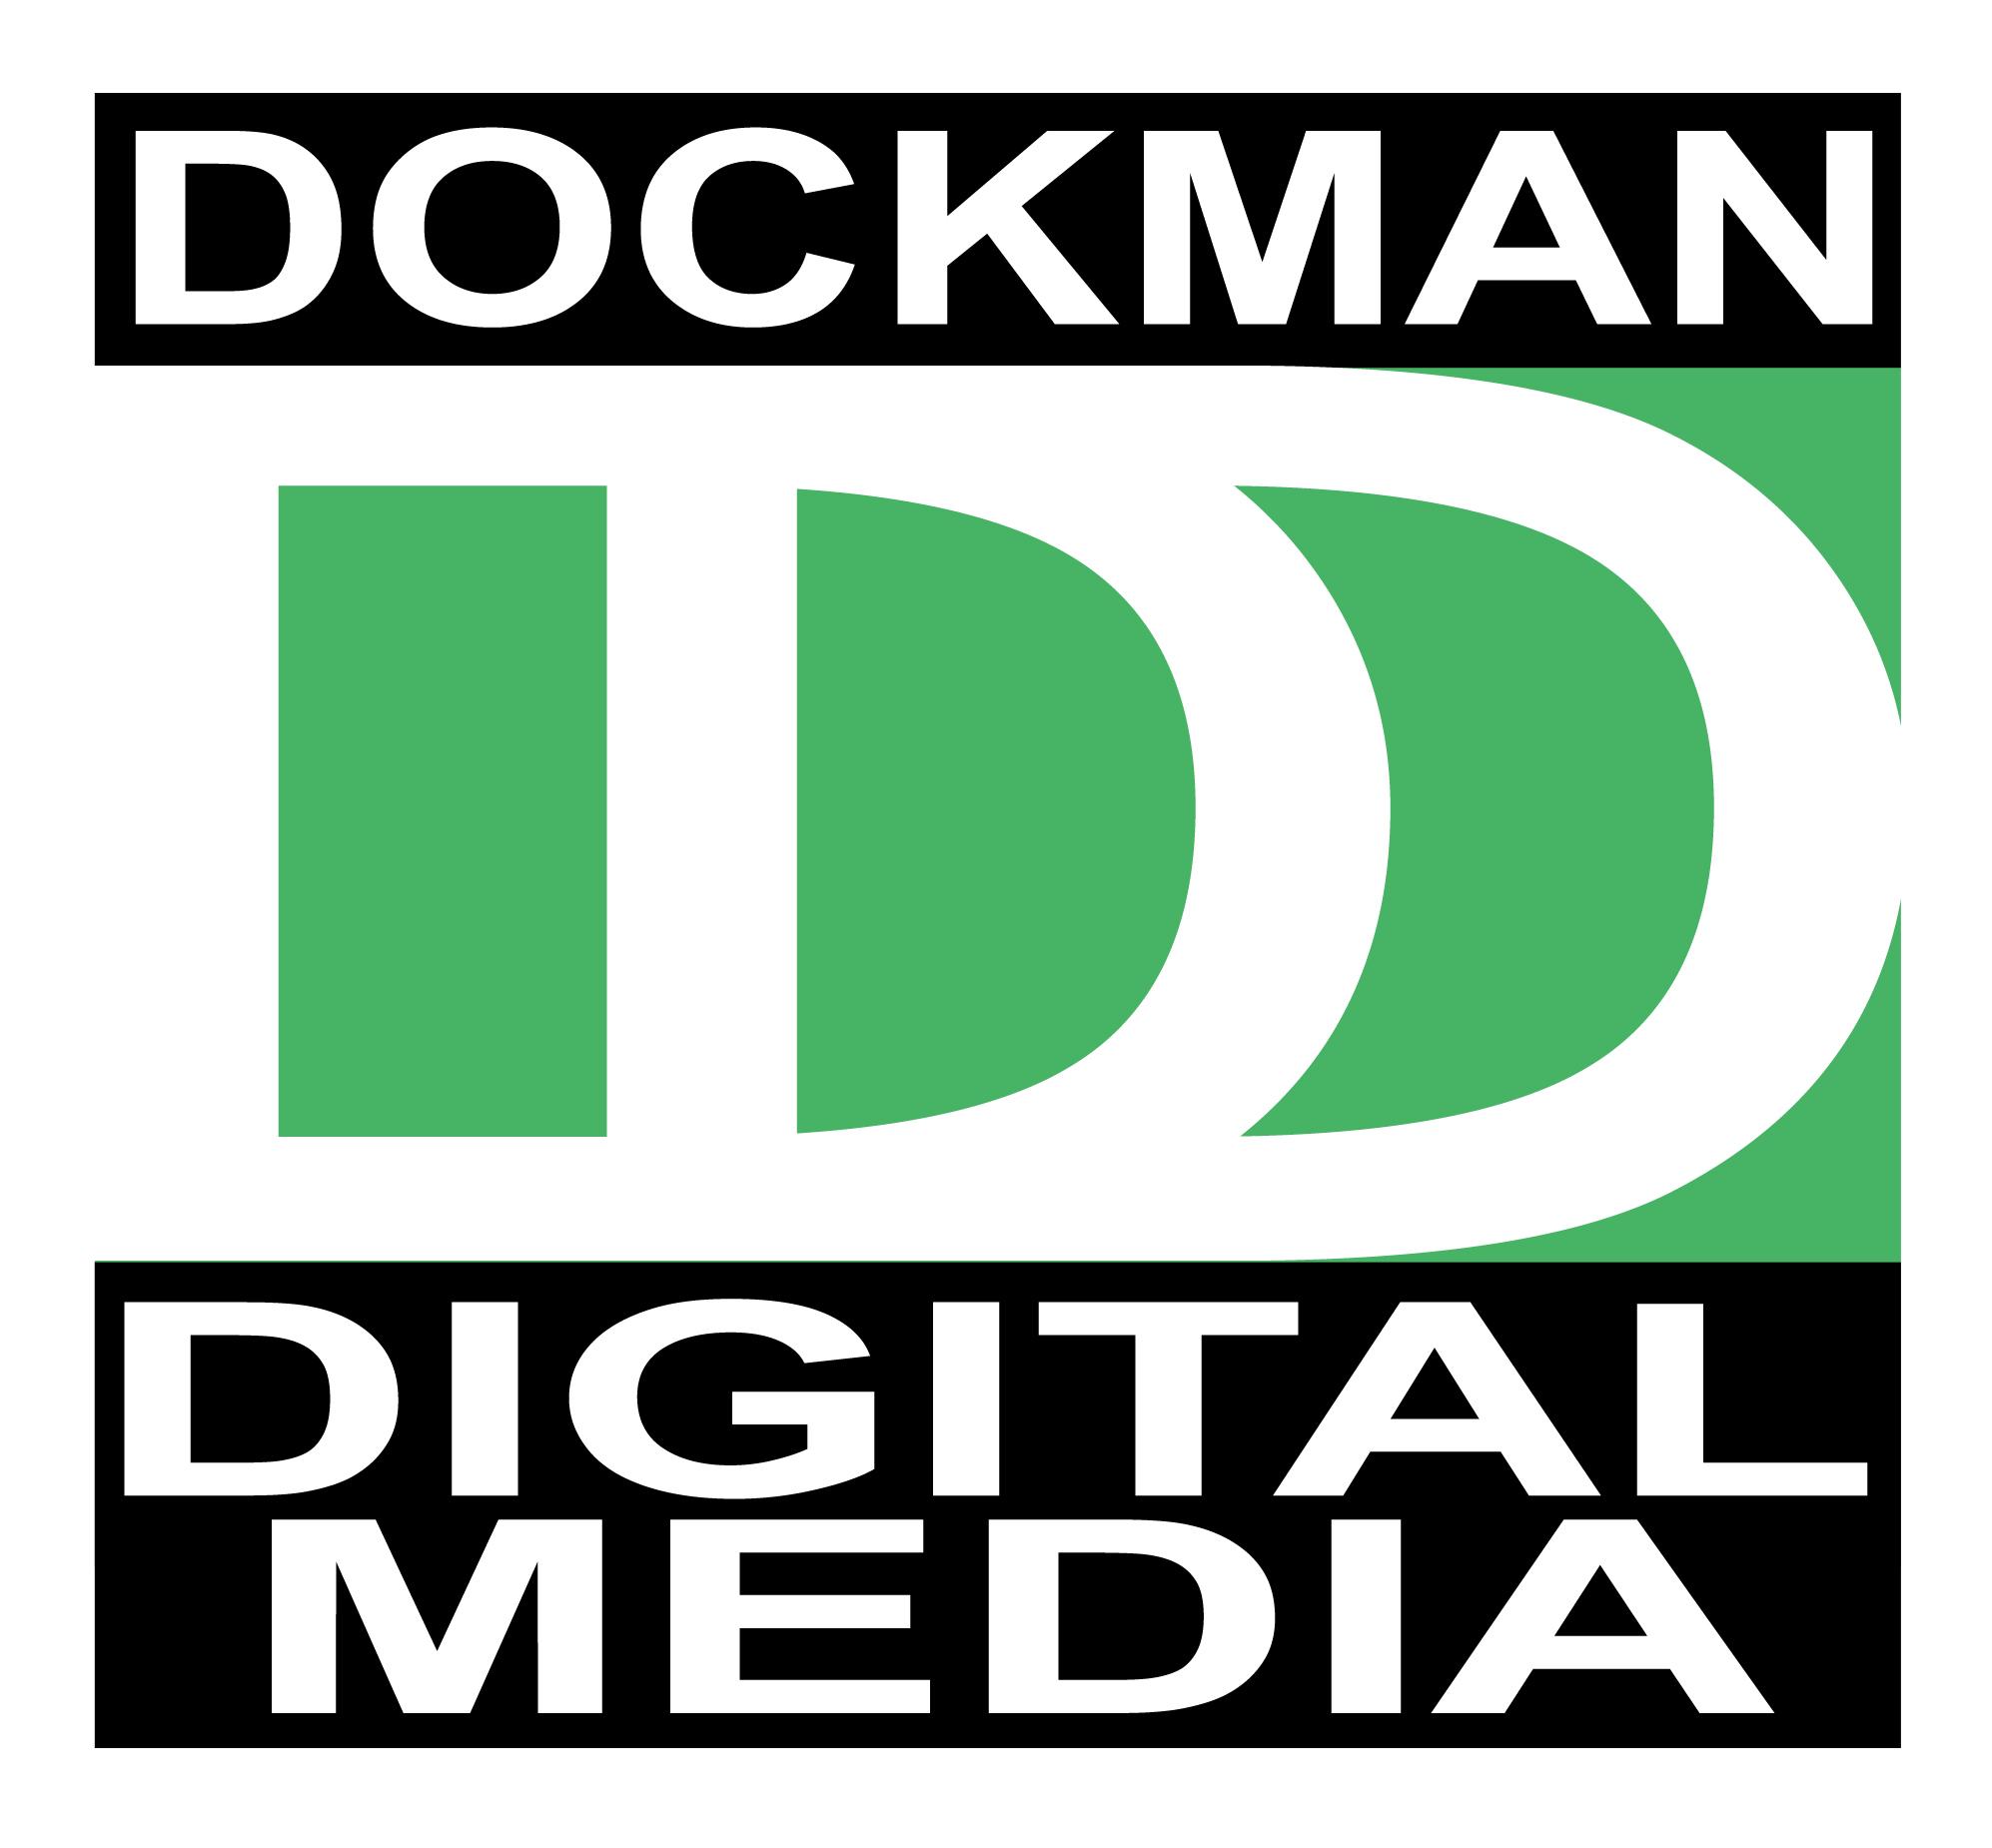 Dockman Digital Media